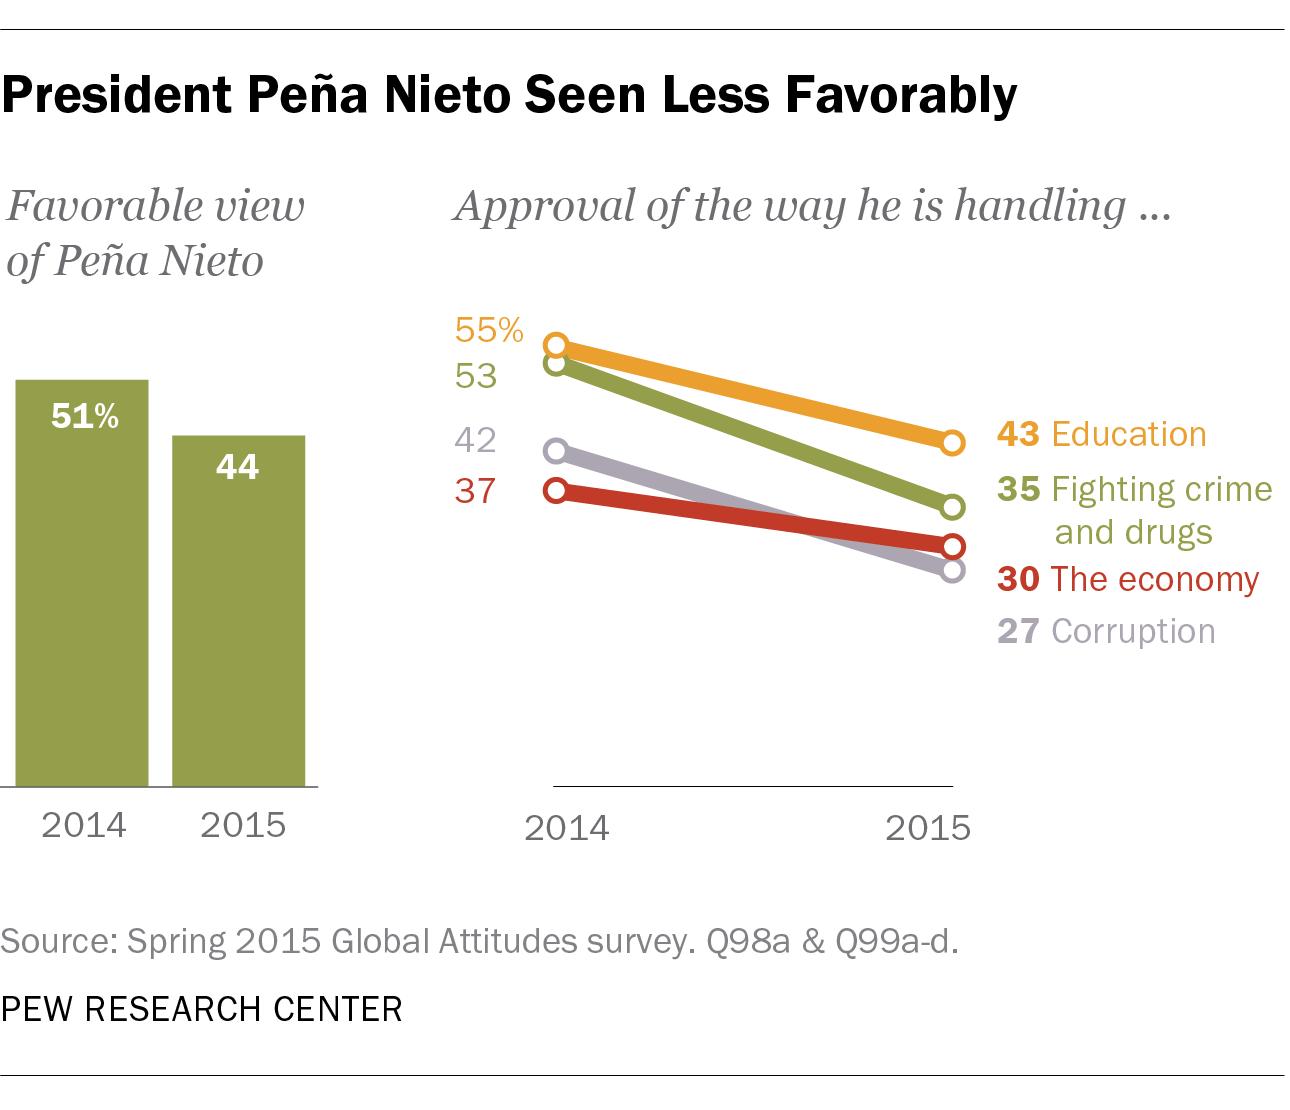 President Peña Nieto Seen Less Favorably